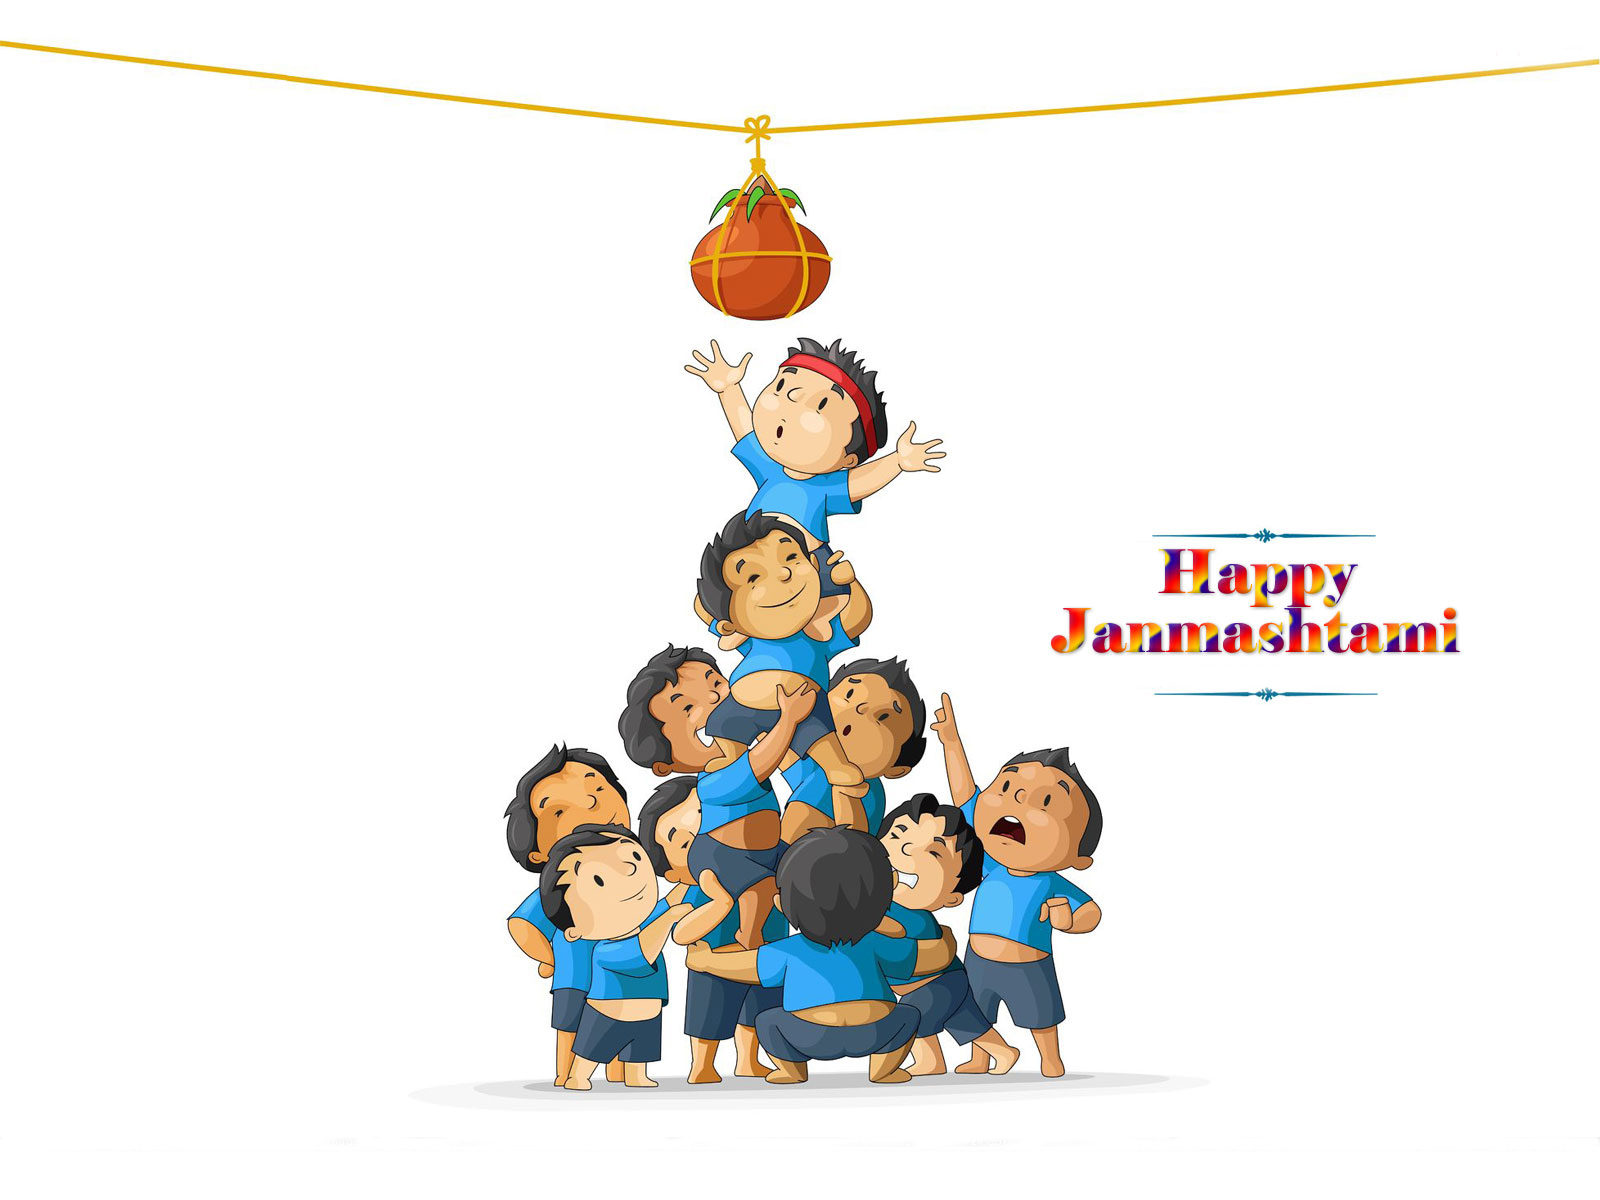 Happy Krishna Janmashtami Status Messages SMS Quotes Poem Wishes in Marathi  u0026 Urdu - Krishna Janmashtami PNG